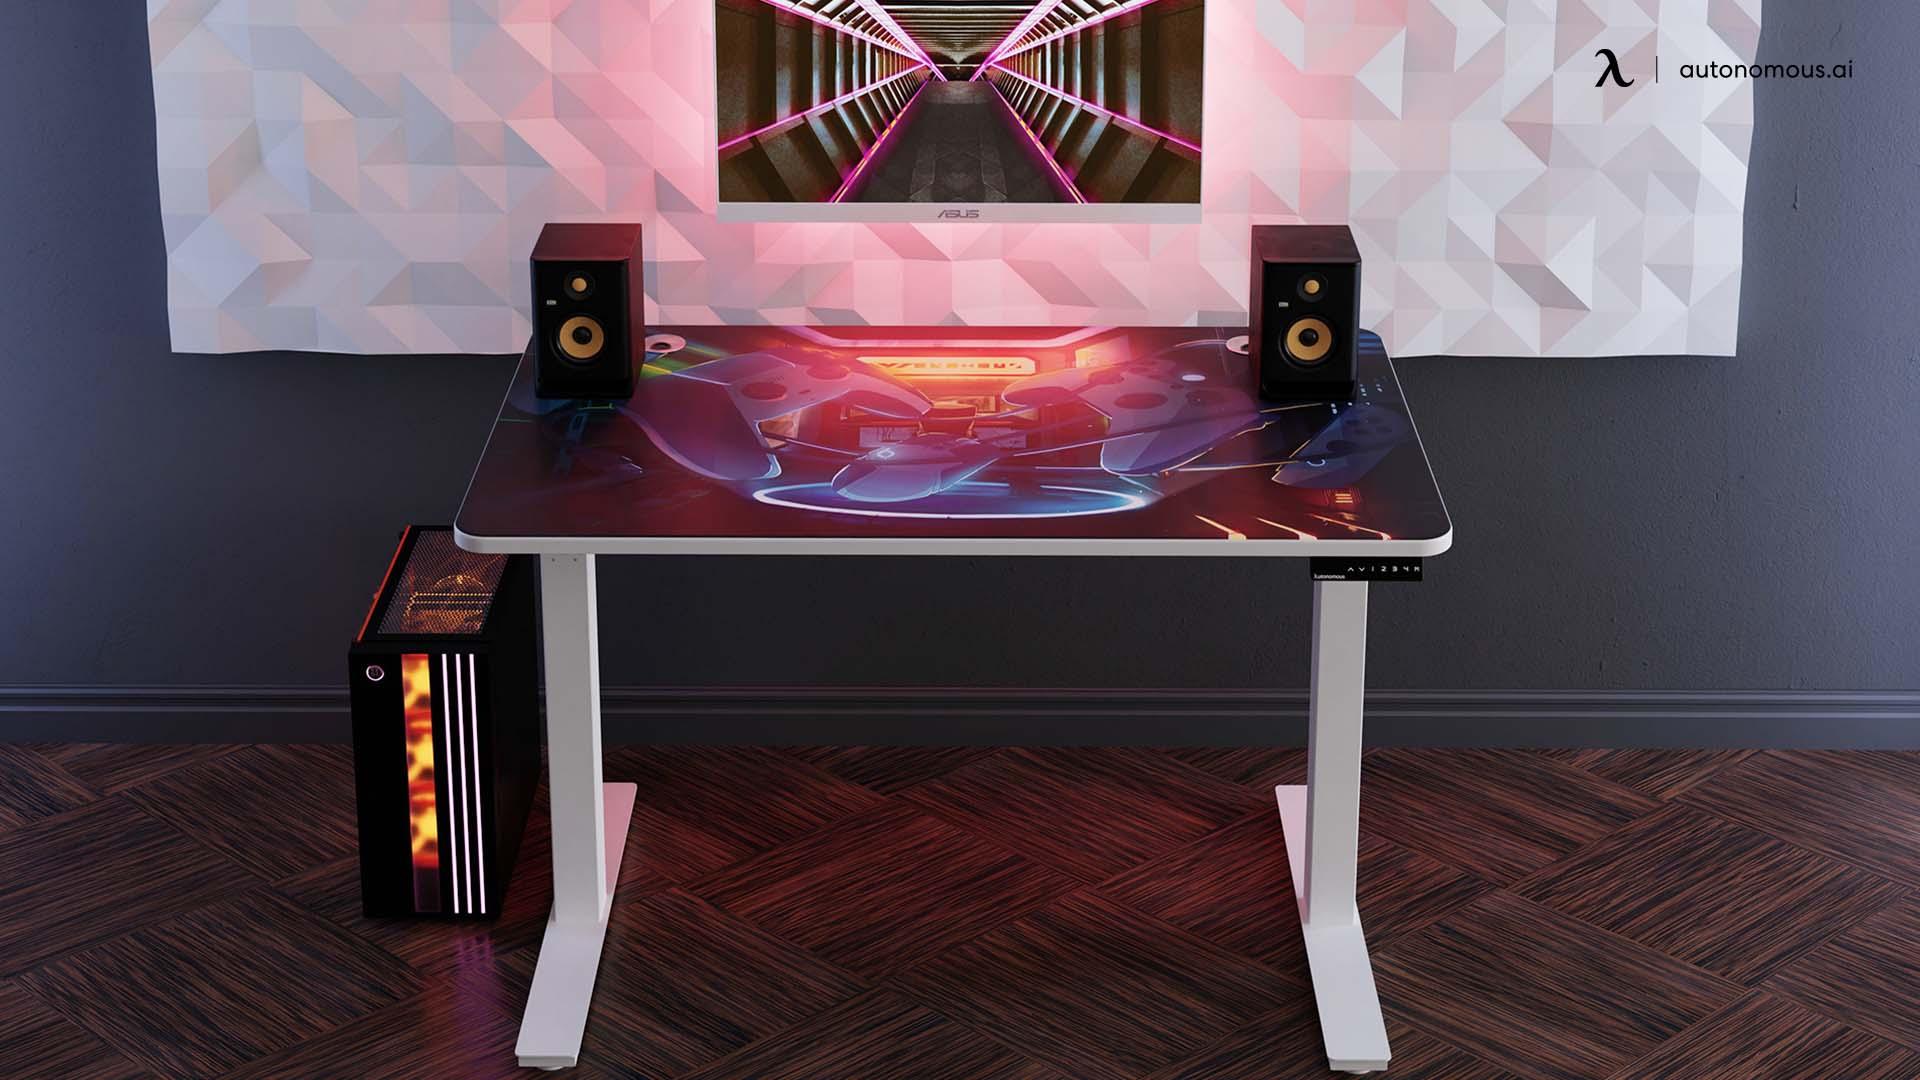 The Best Adjustable Gaming Computer Desk in the UK